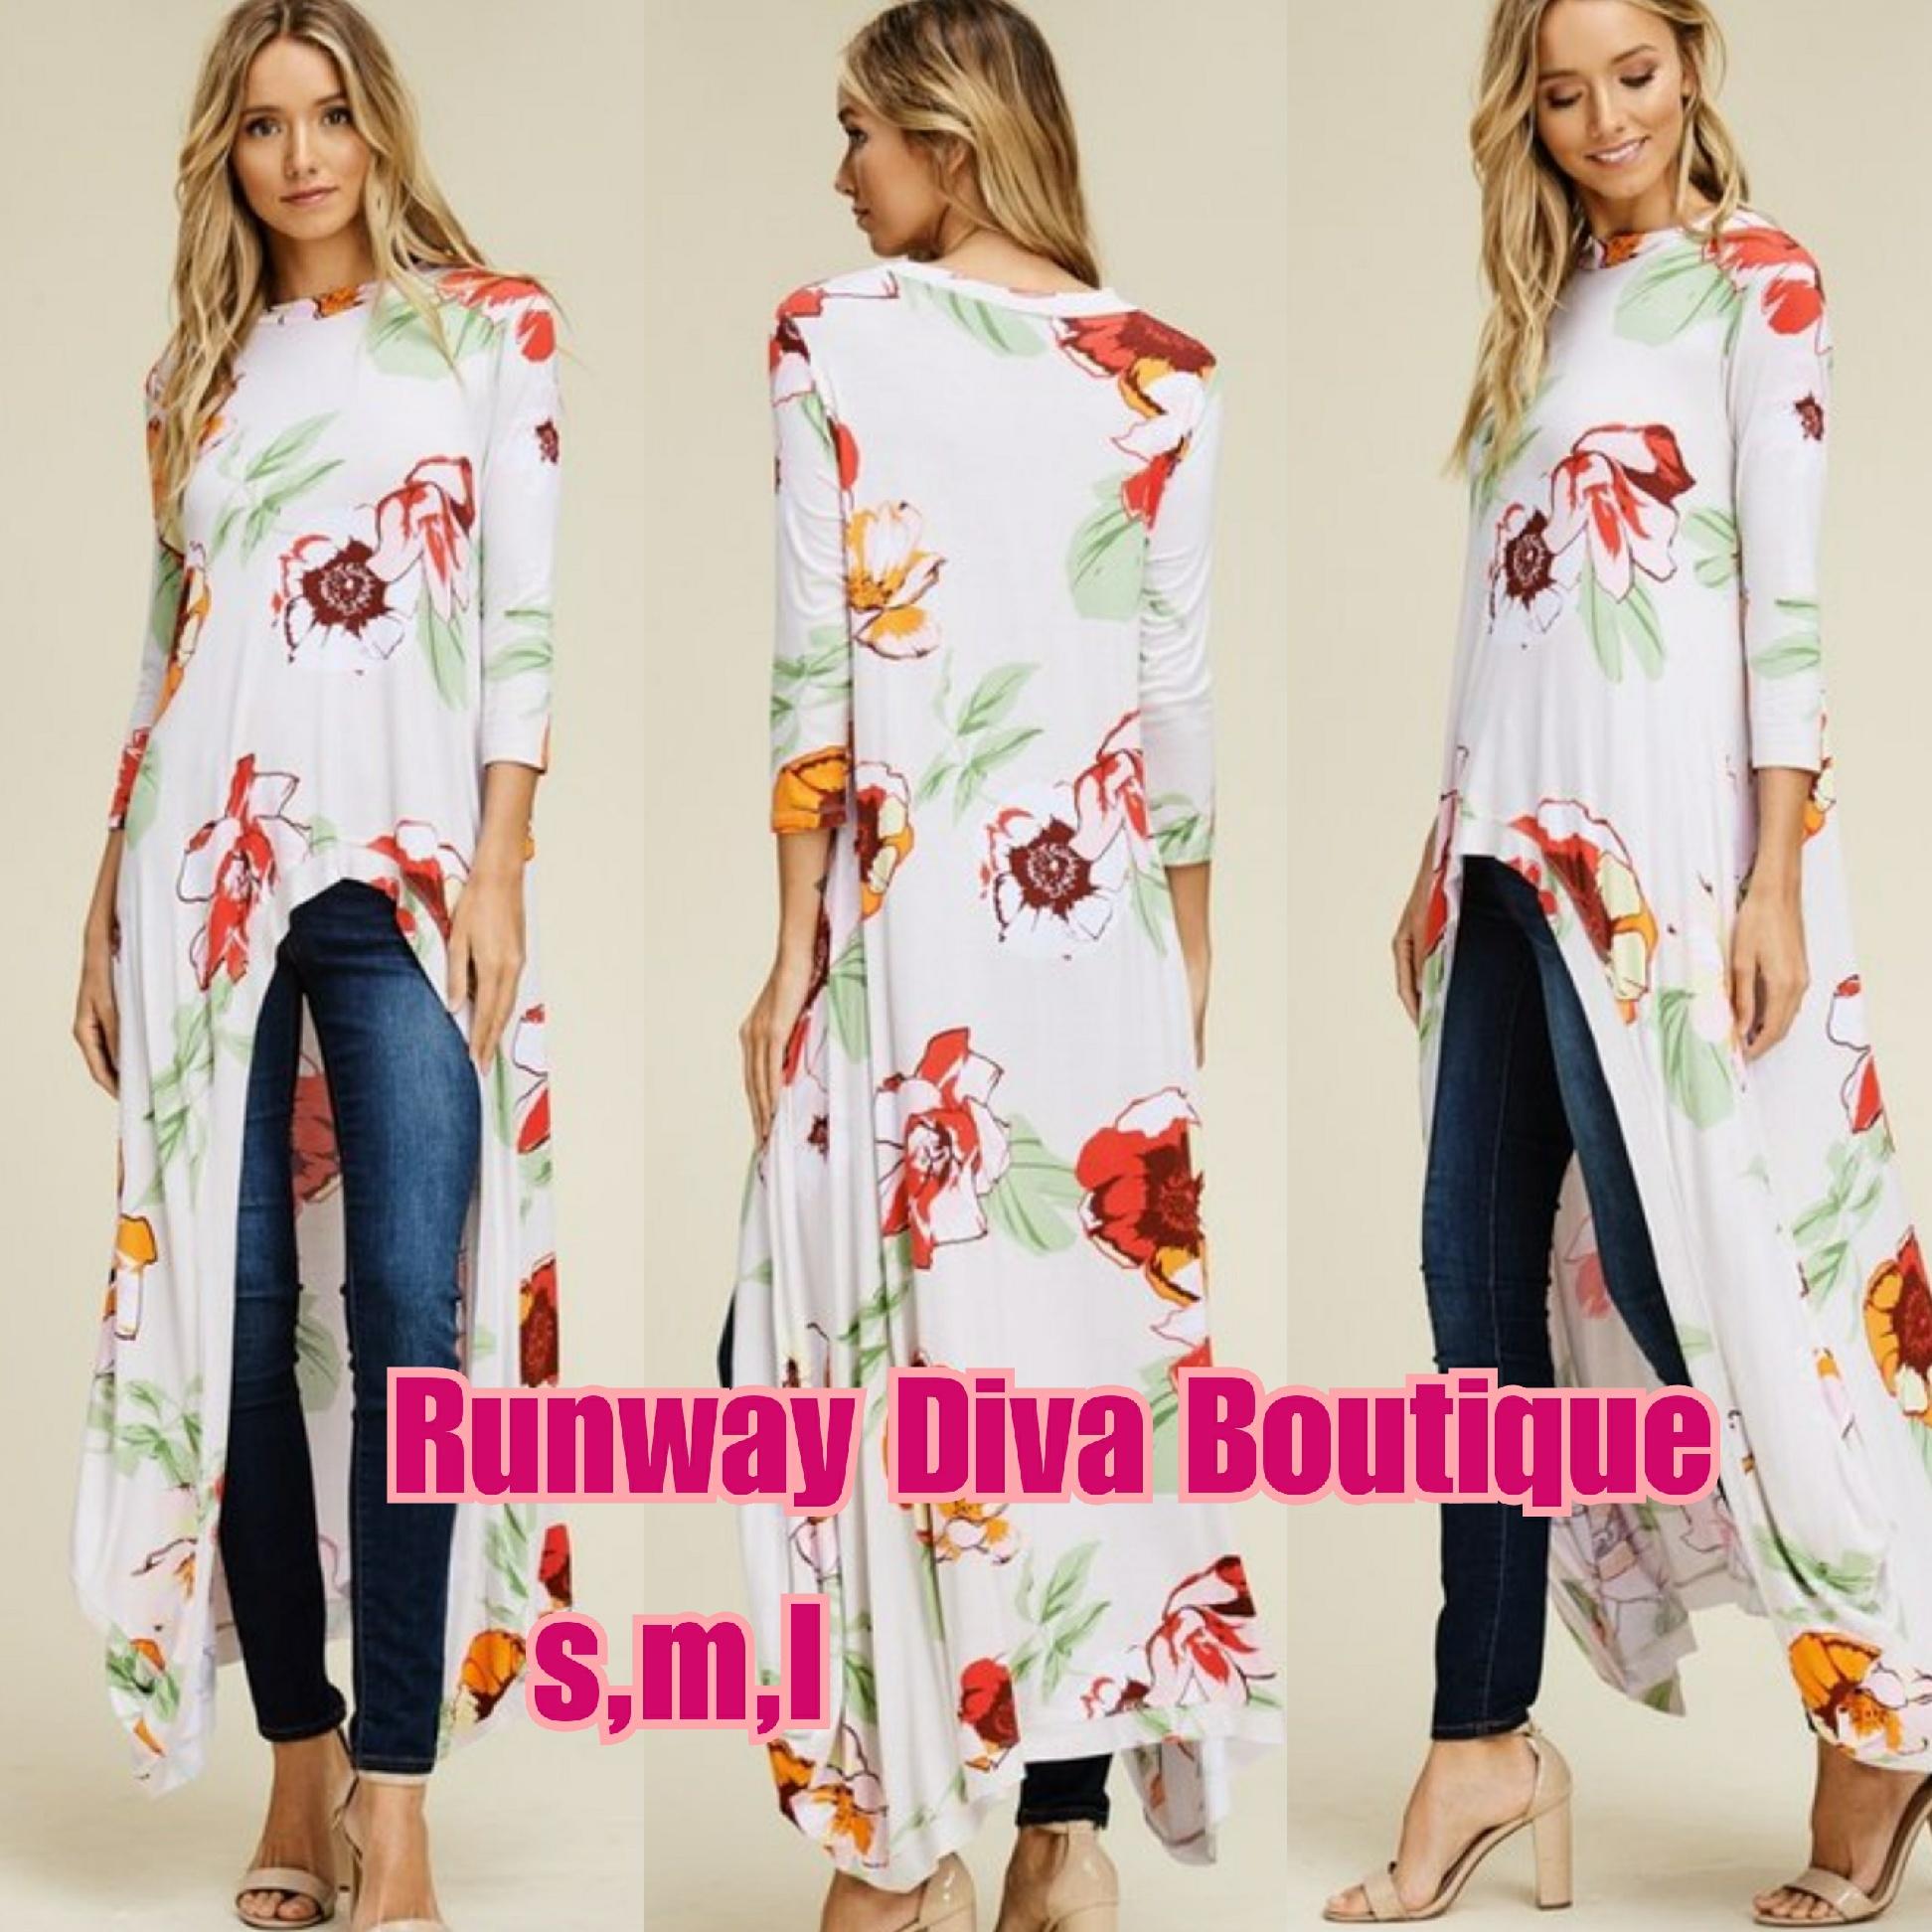 cd16c79f38 Runway Diva Boutique